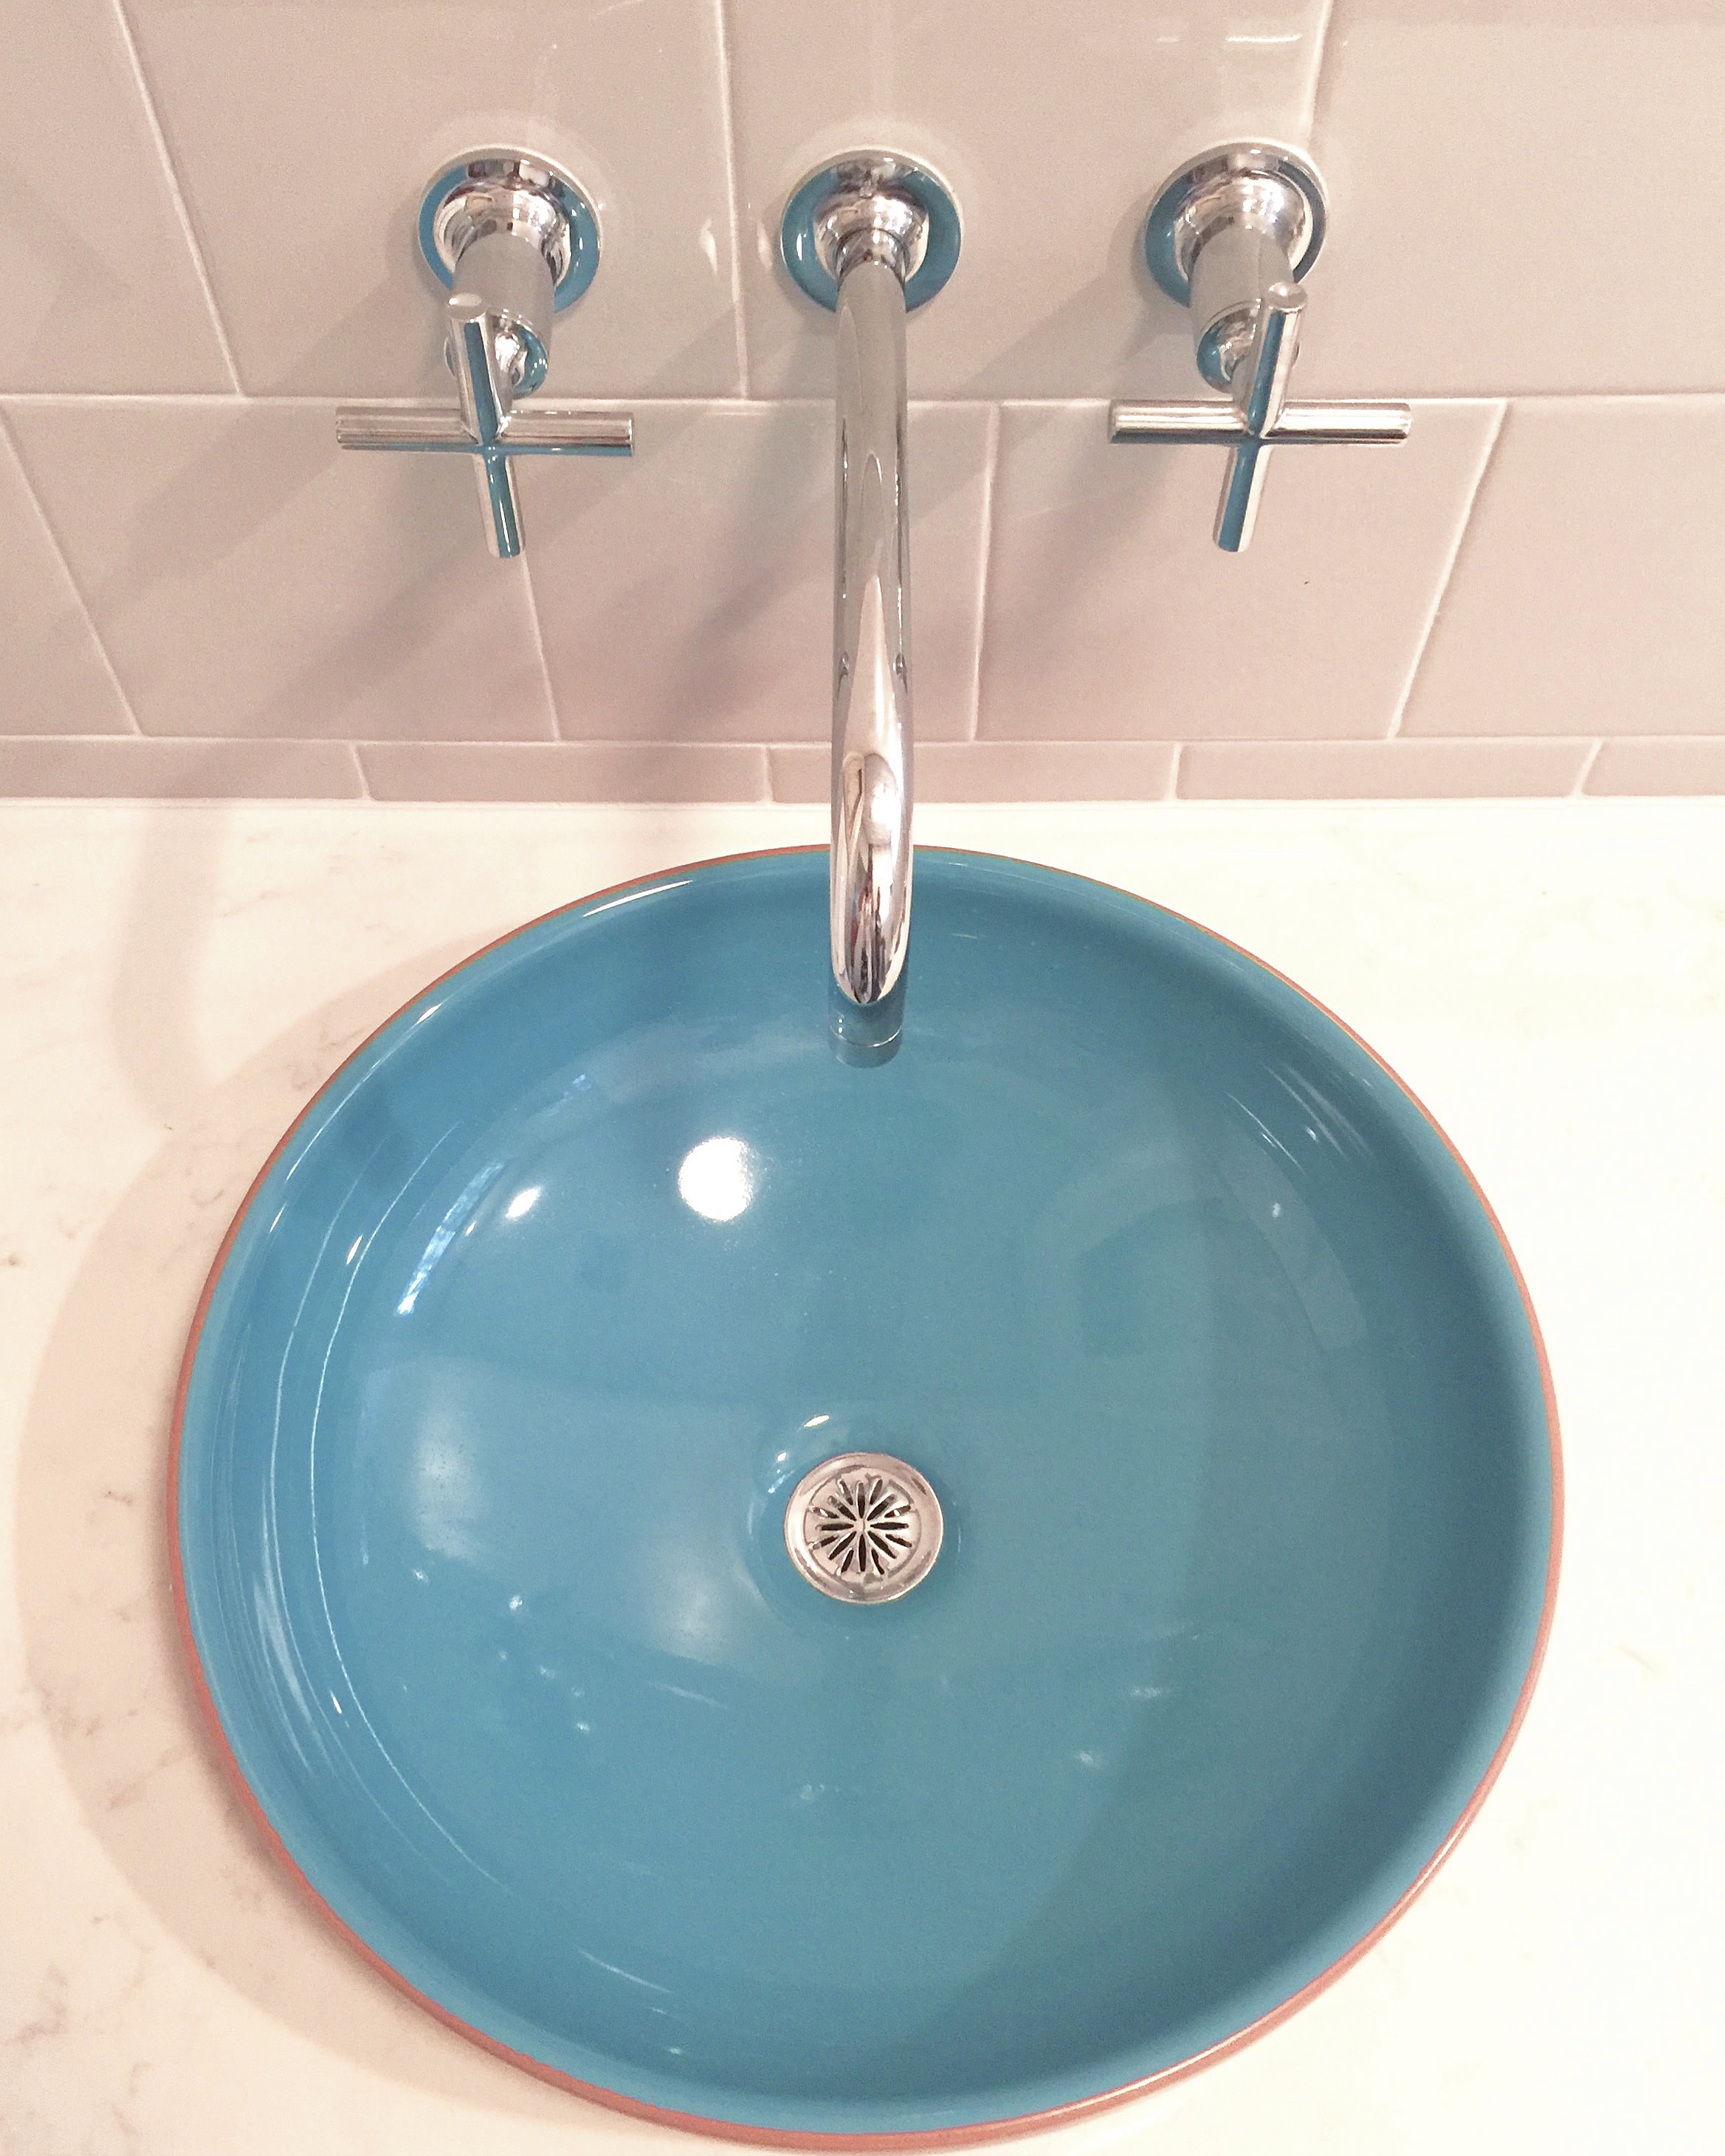 6x6 ceramic tile in modern bathroom